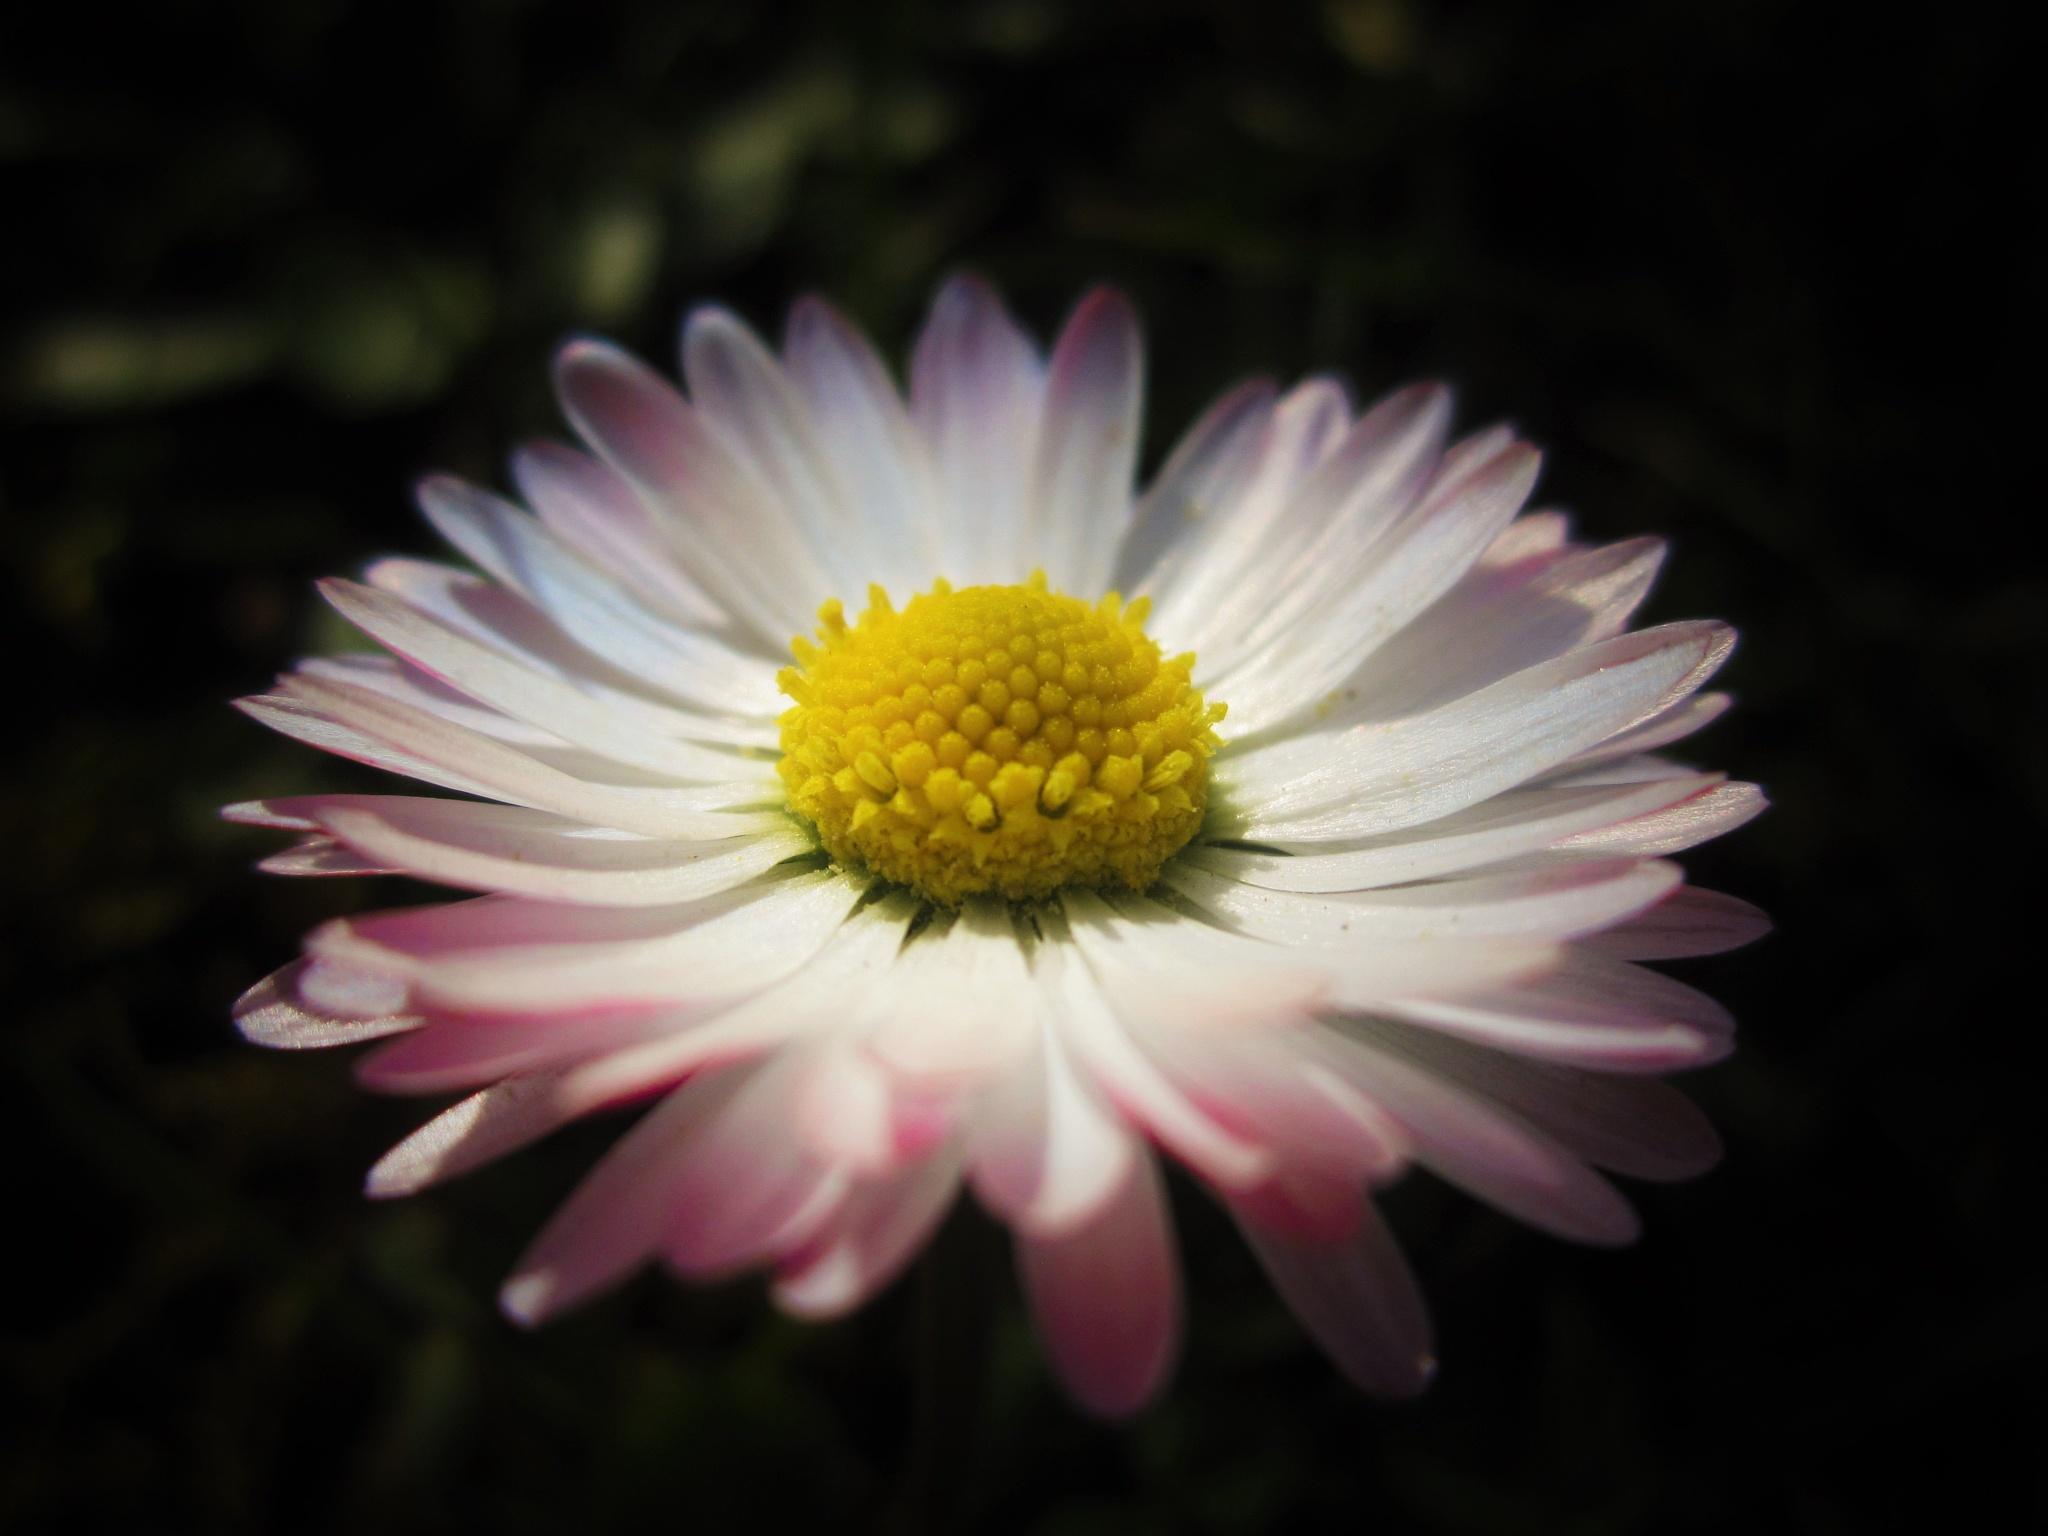 From aunt's garden by Marija Konjik